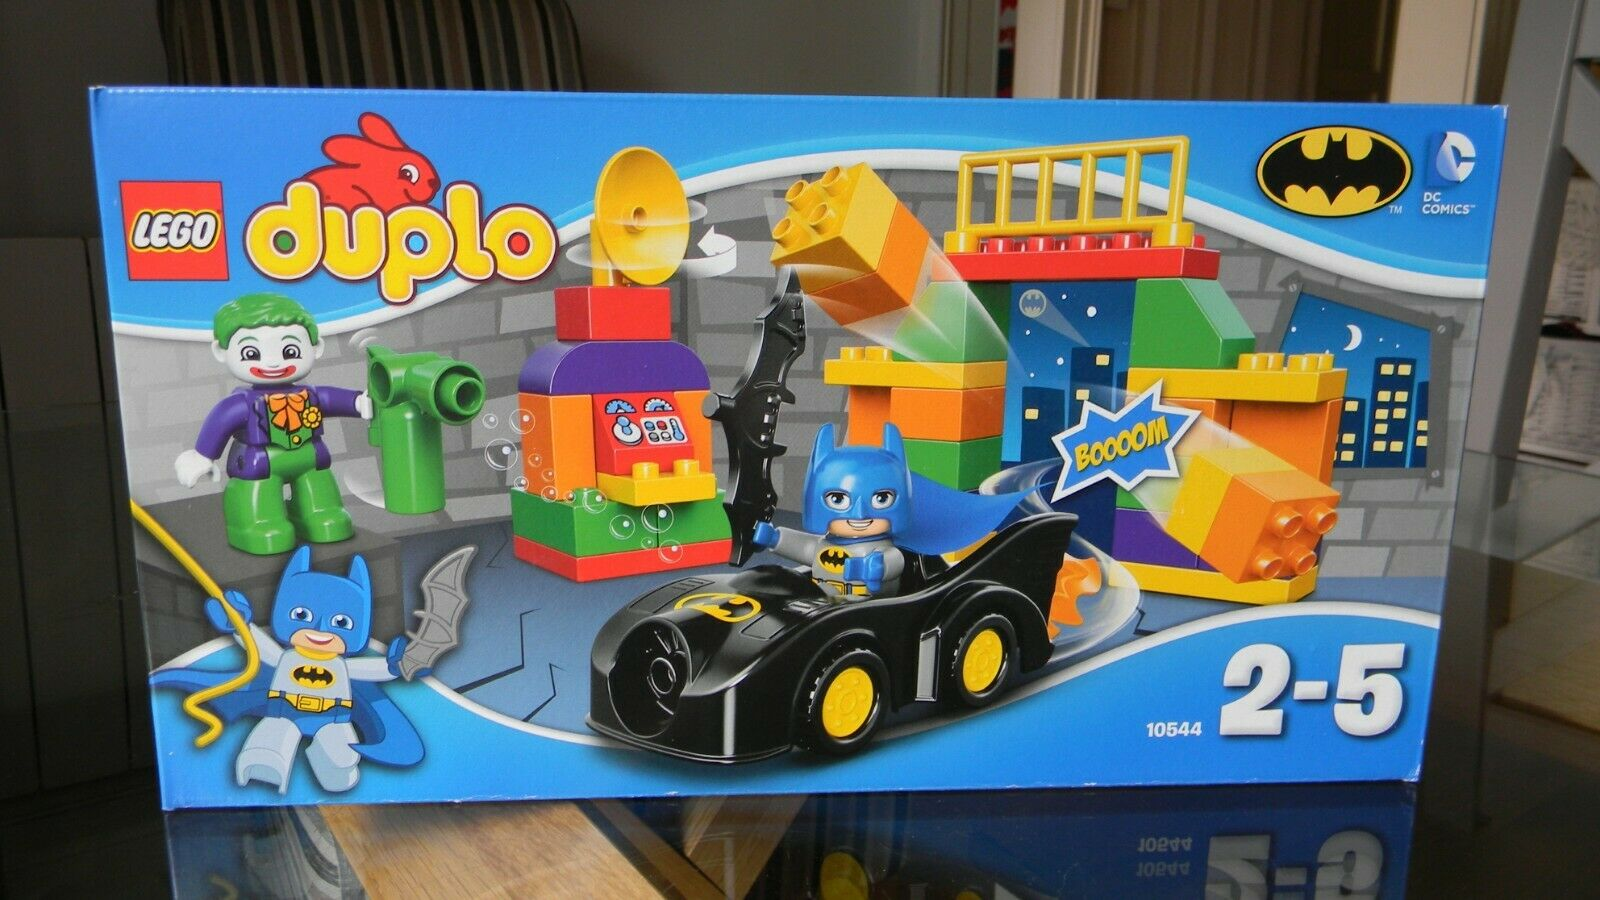 LEGO Duplo-Il Joker CHtuttiENGE  10544  NUOVO SIGILLATO   nuovo sadico